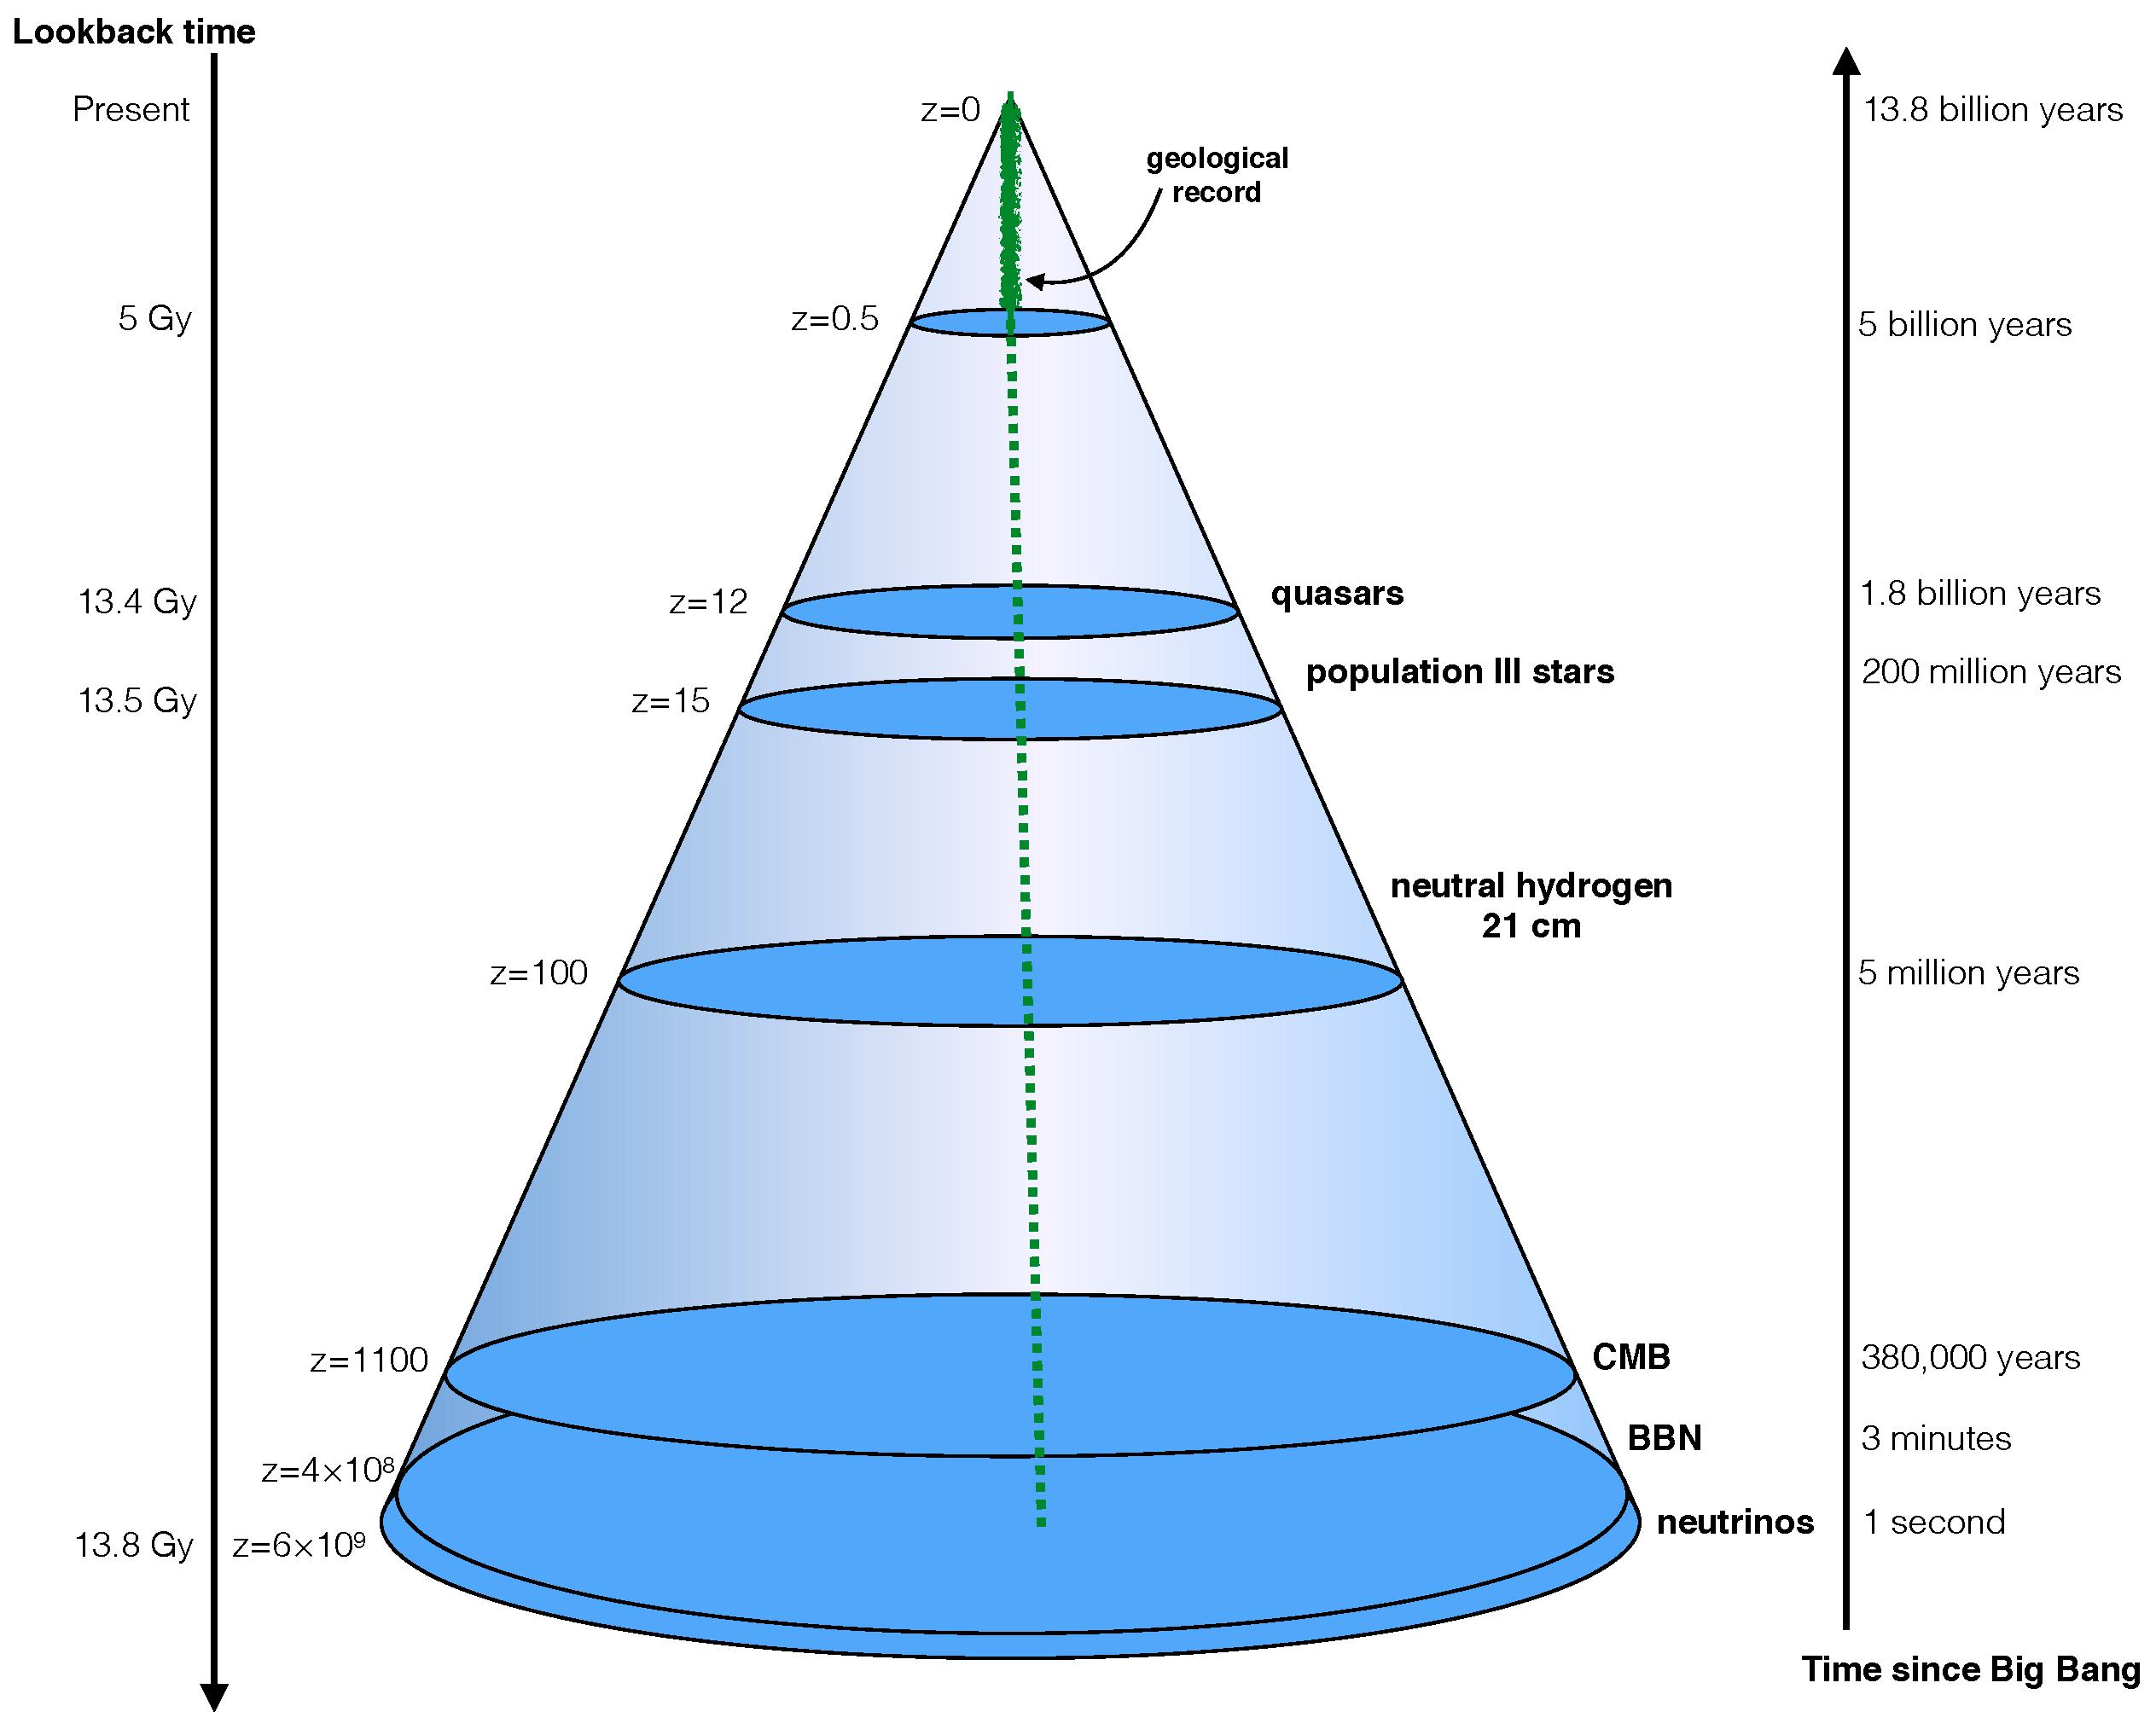 spacecraft mod 1-3 2-4 betting system